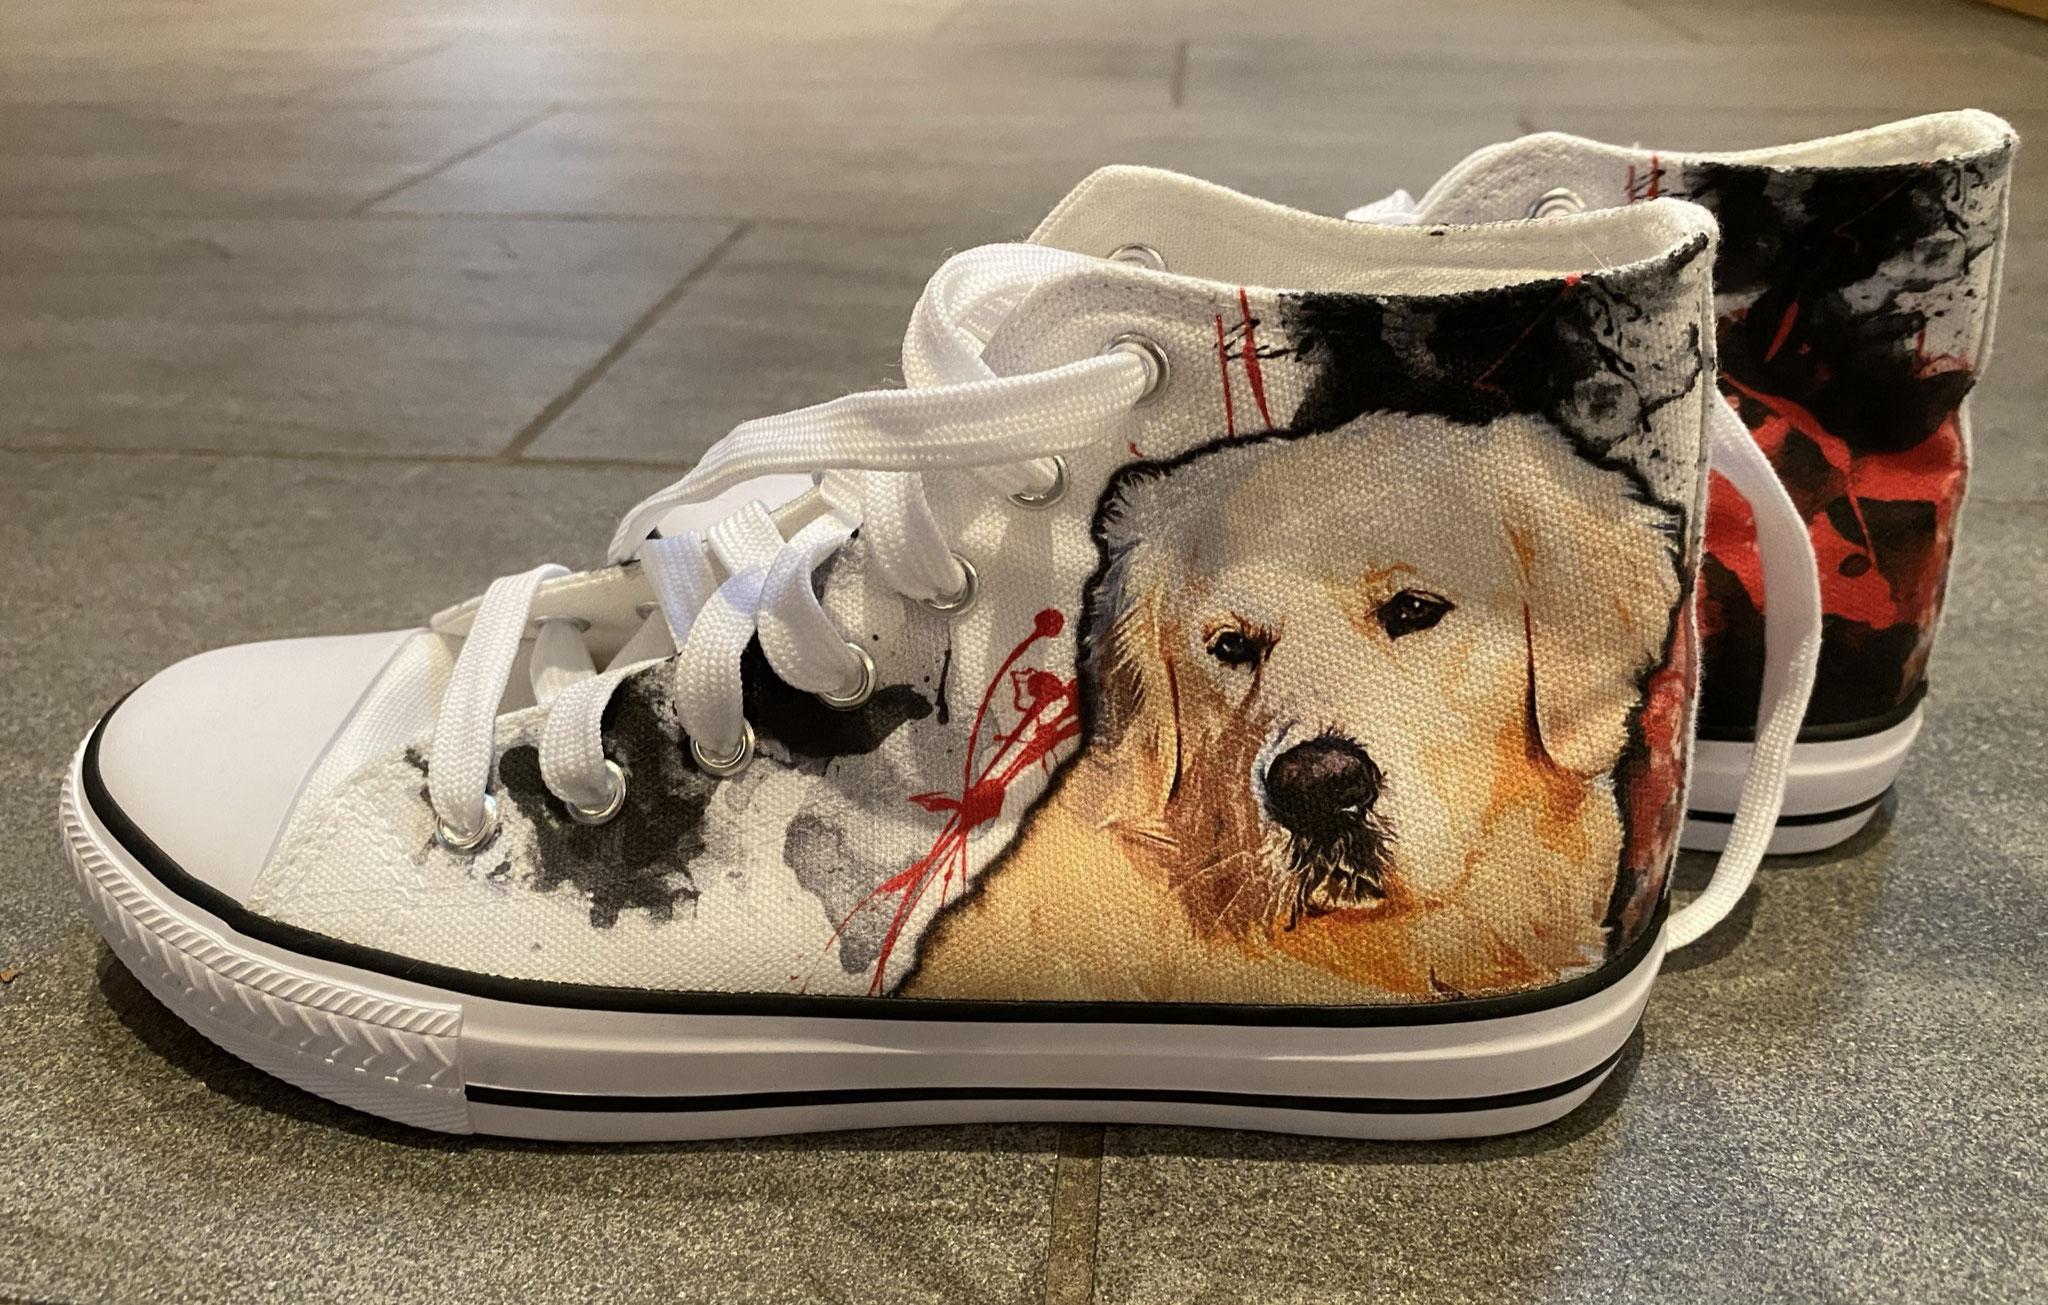 DIE ultimativen Jojo-Schuhe :-)   -   Best than ever!!